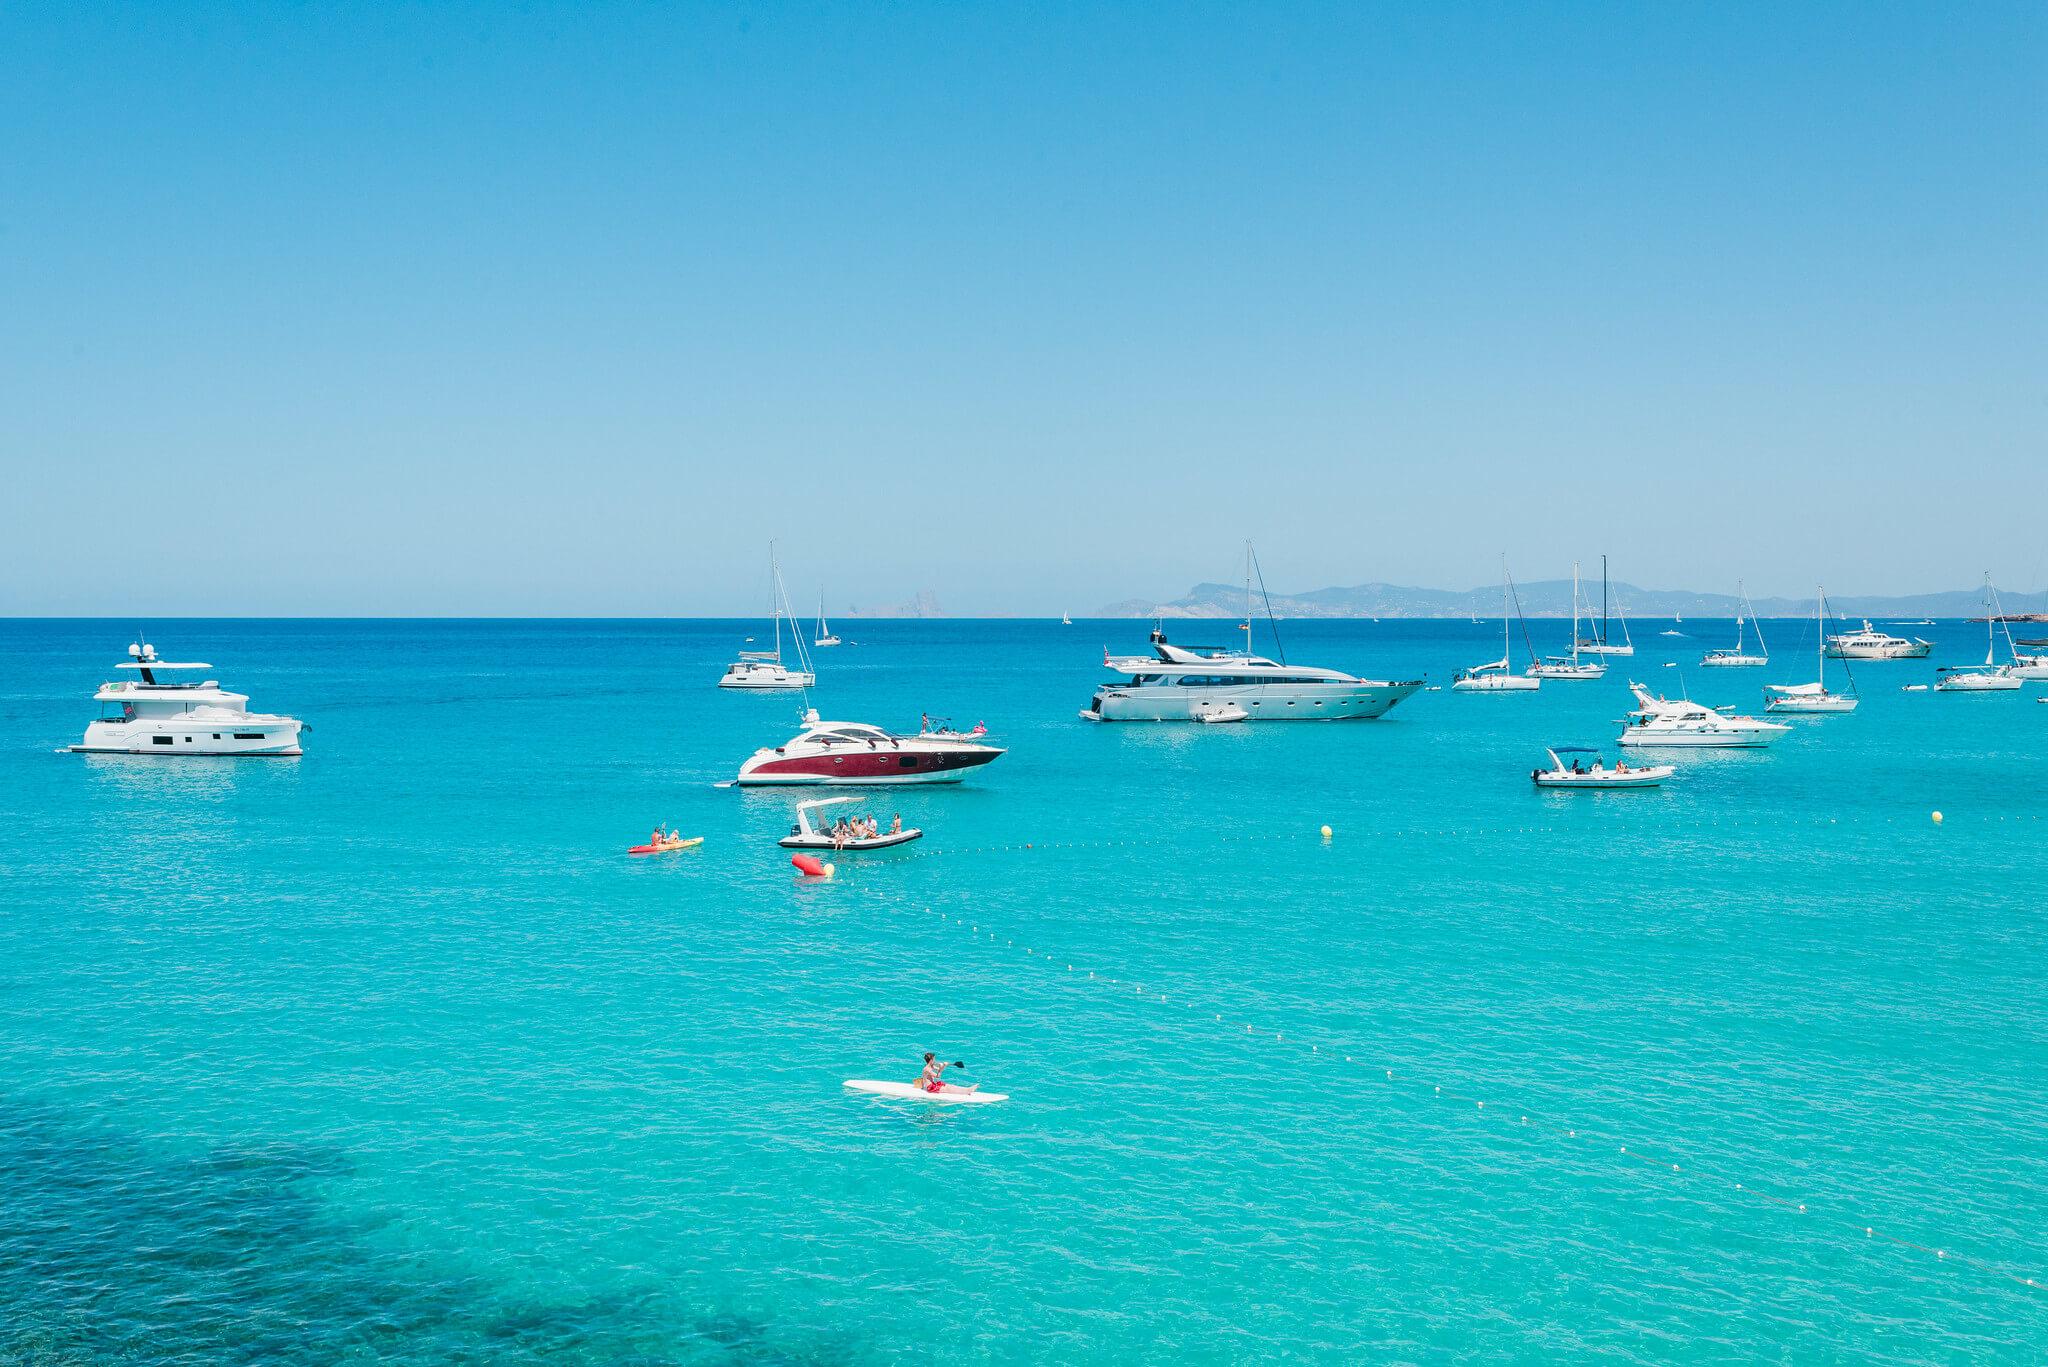 https://www.white-ibiza.com/wp-content/uploads/2020/03/formentera-beaches-cala-saona-2020-05.jpg